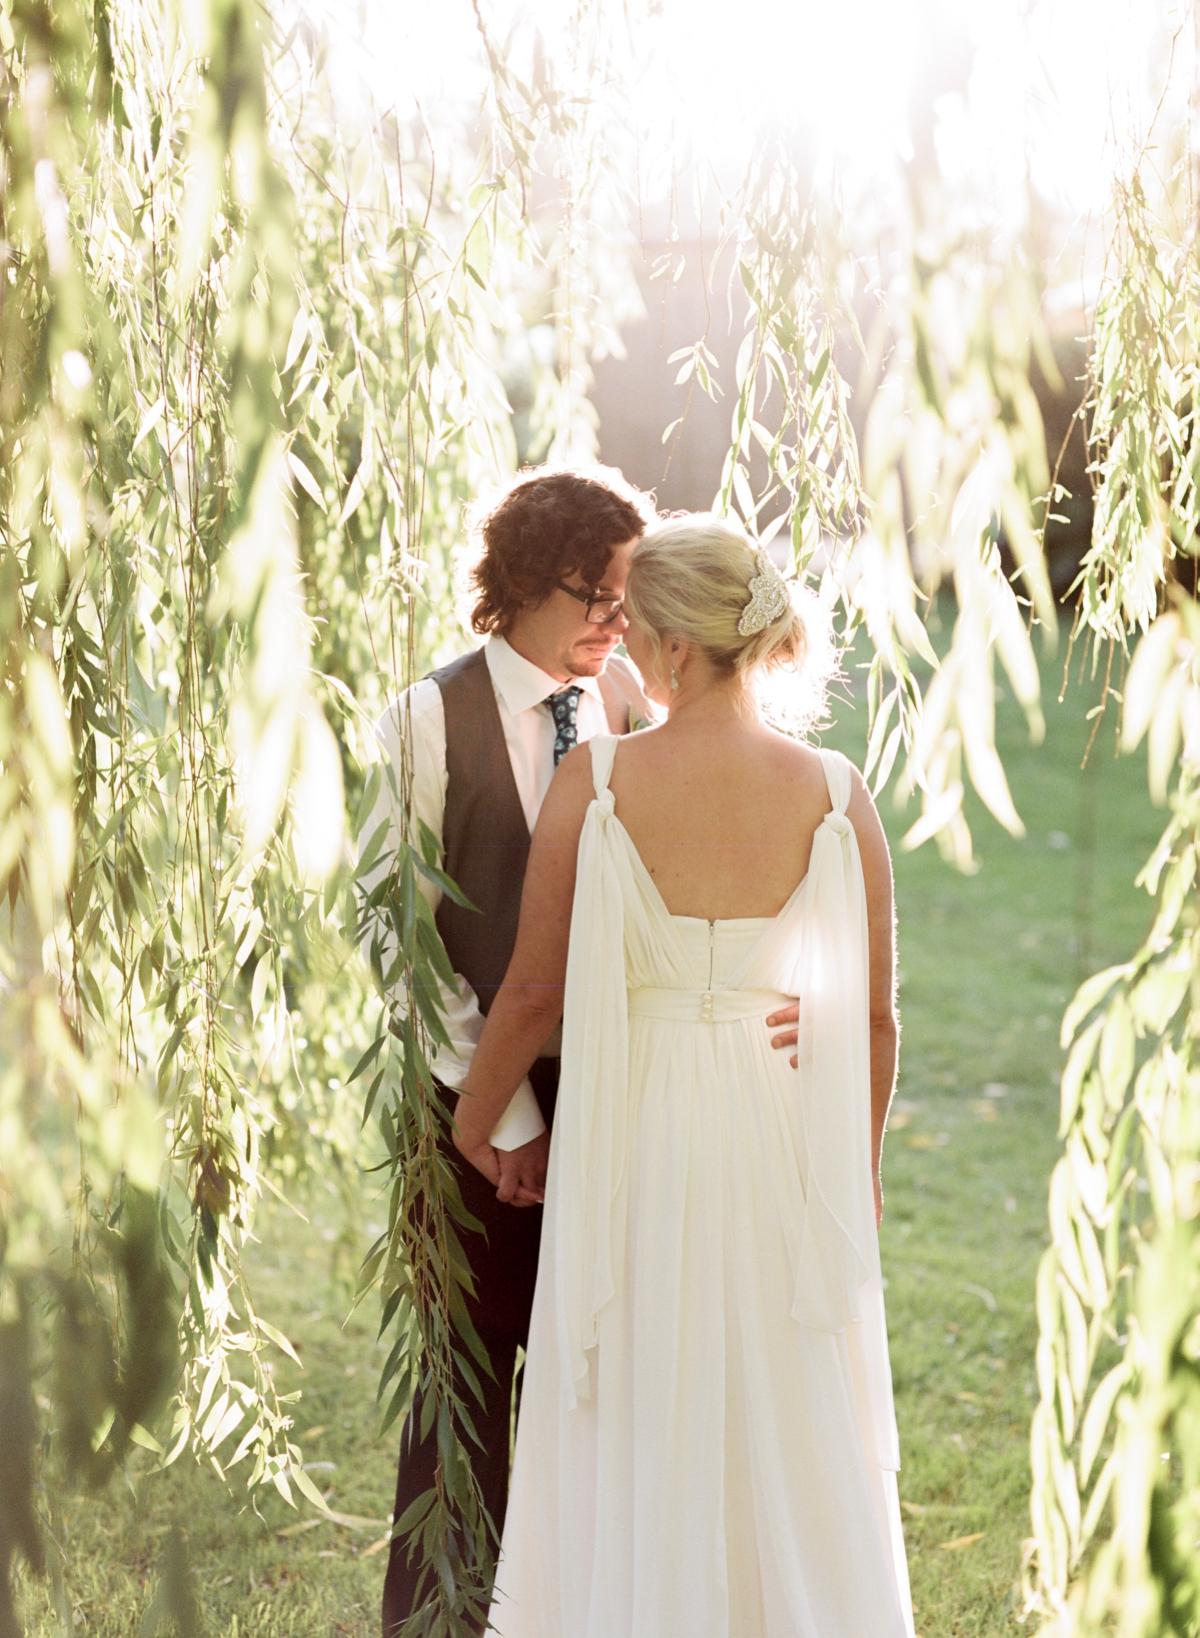 Monterose berry farm wedding by Mr Edwards Photography_0743.jpg